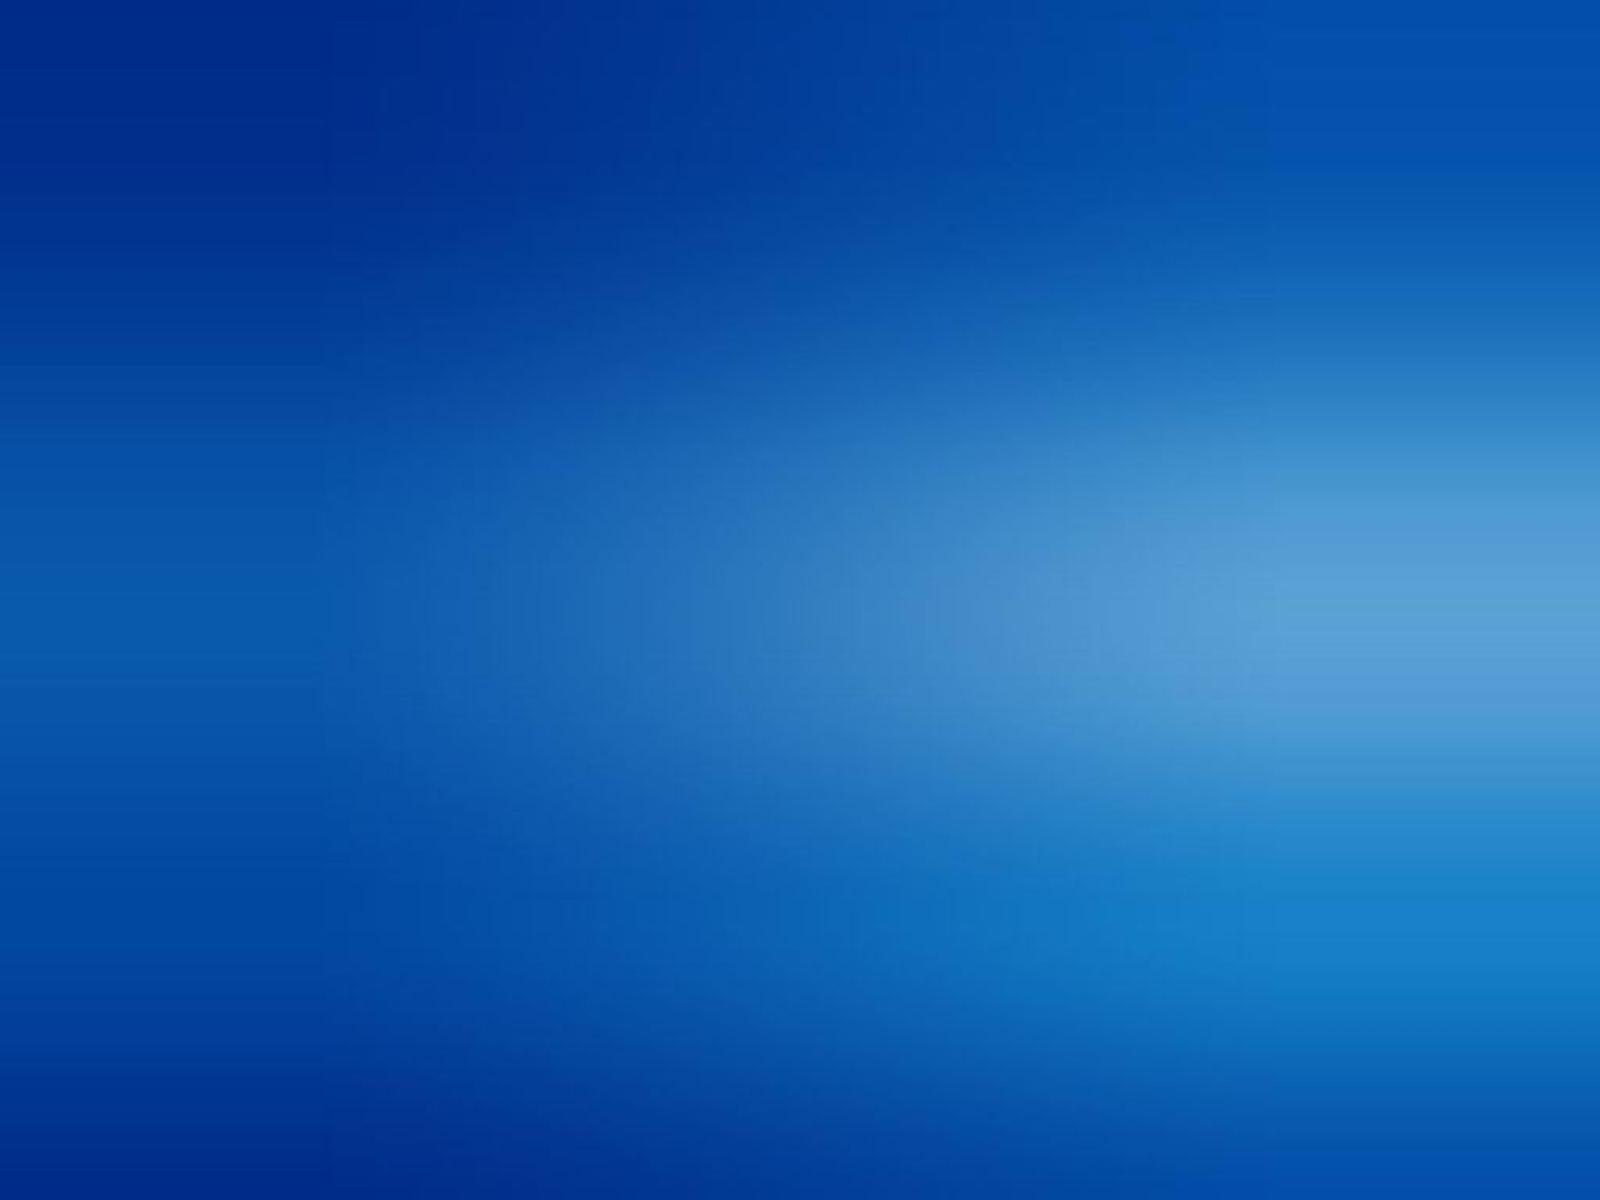 1600x1200 Plain Blue Background Wallpaper